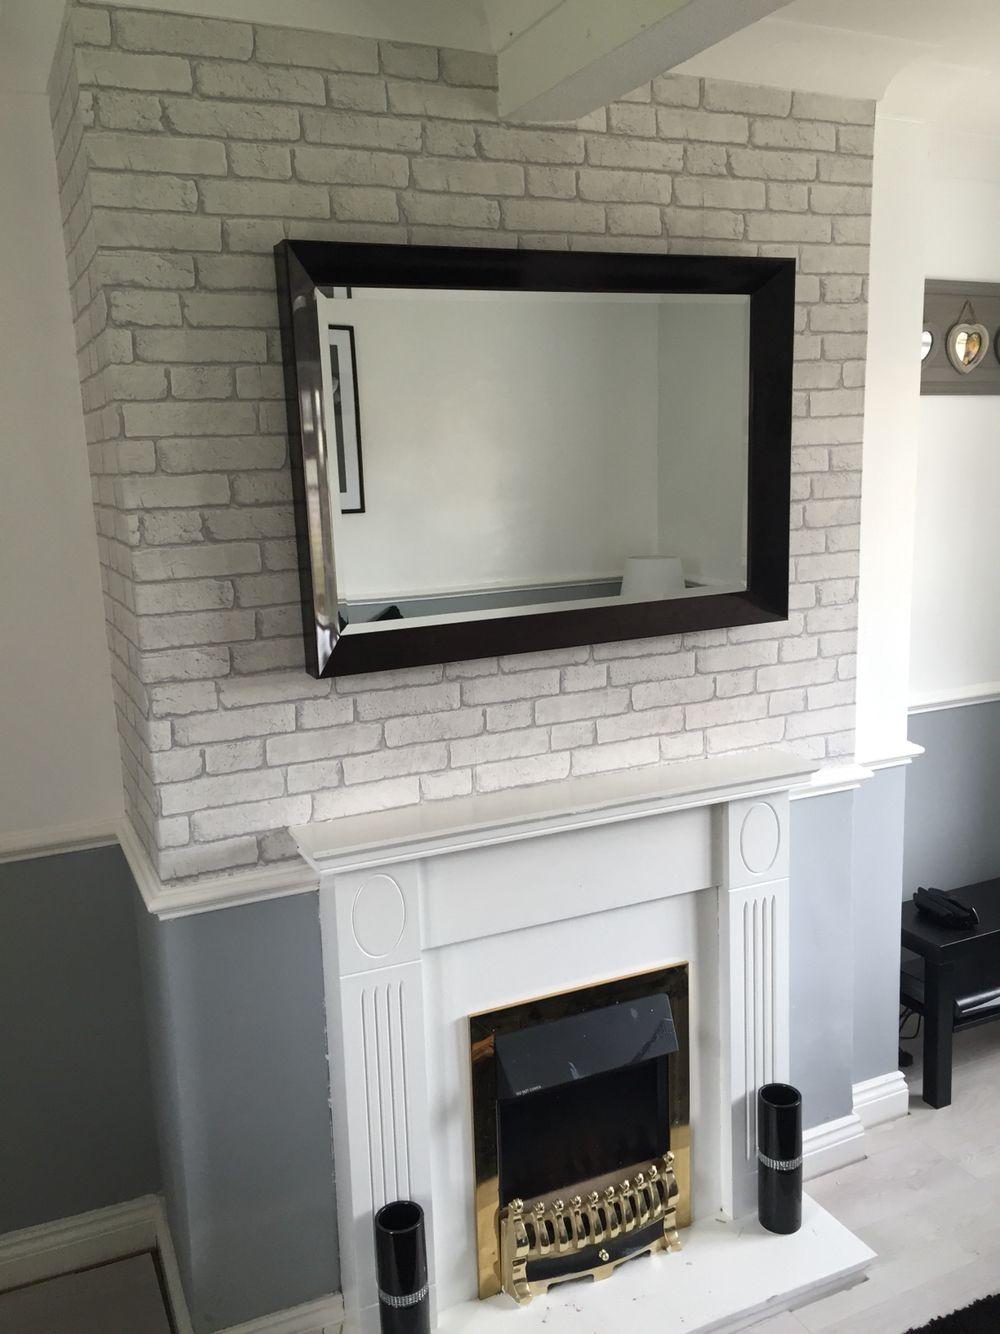 Brick wall wallpaper for chimney breast   living room ideas in 2019